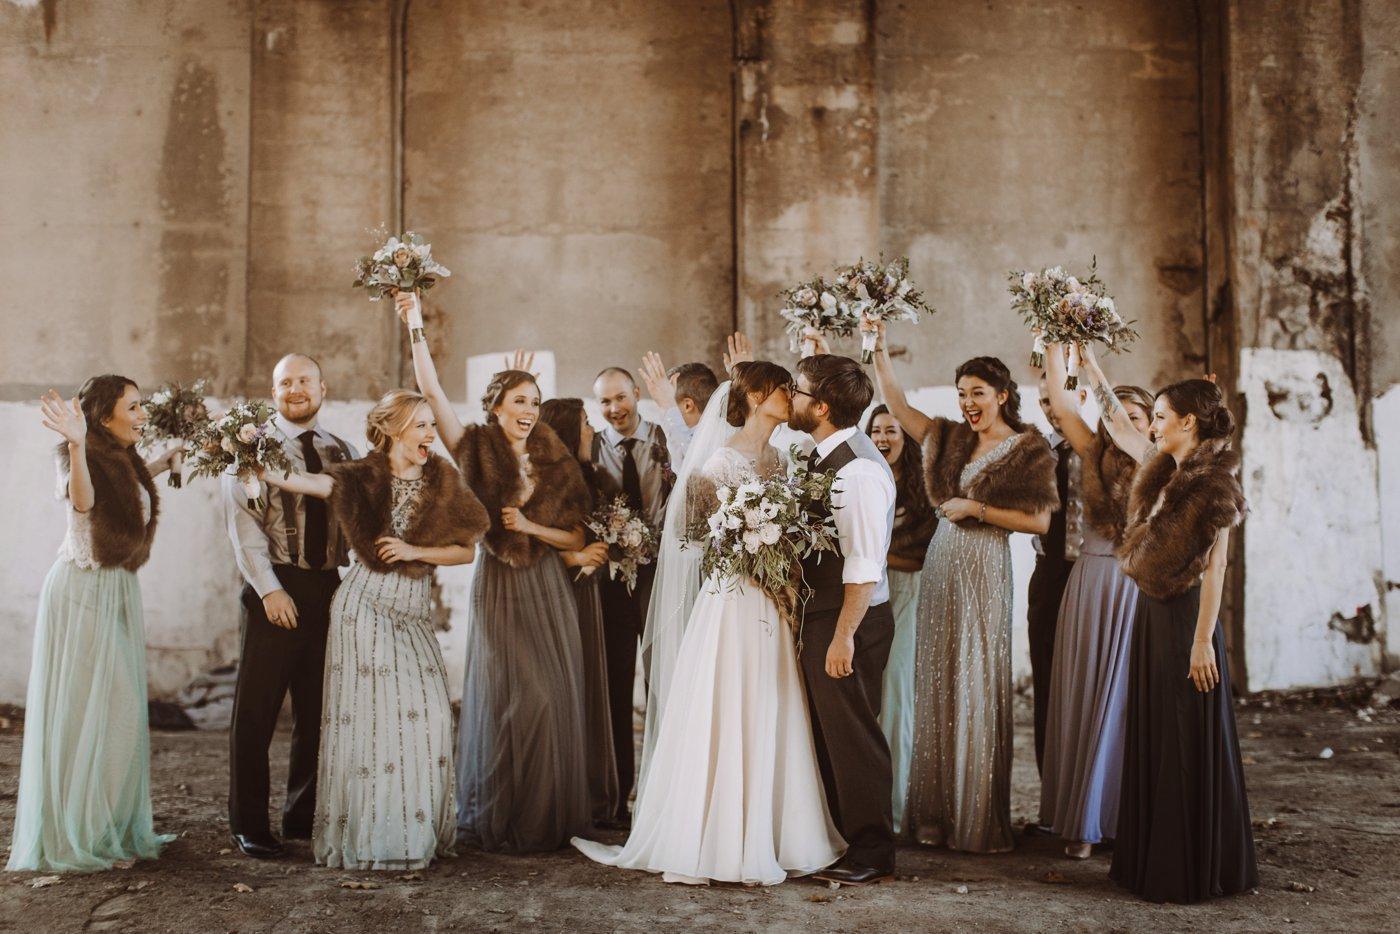 bridal party portraits Mt. Washington Mill Dye House Baltimore wedding photographer